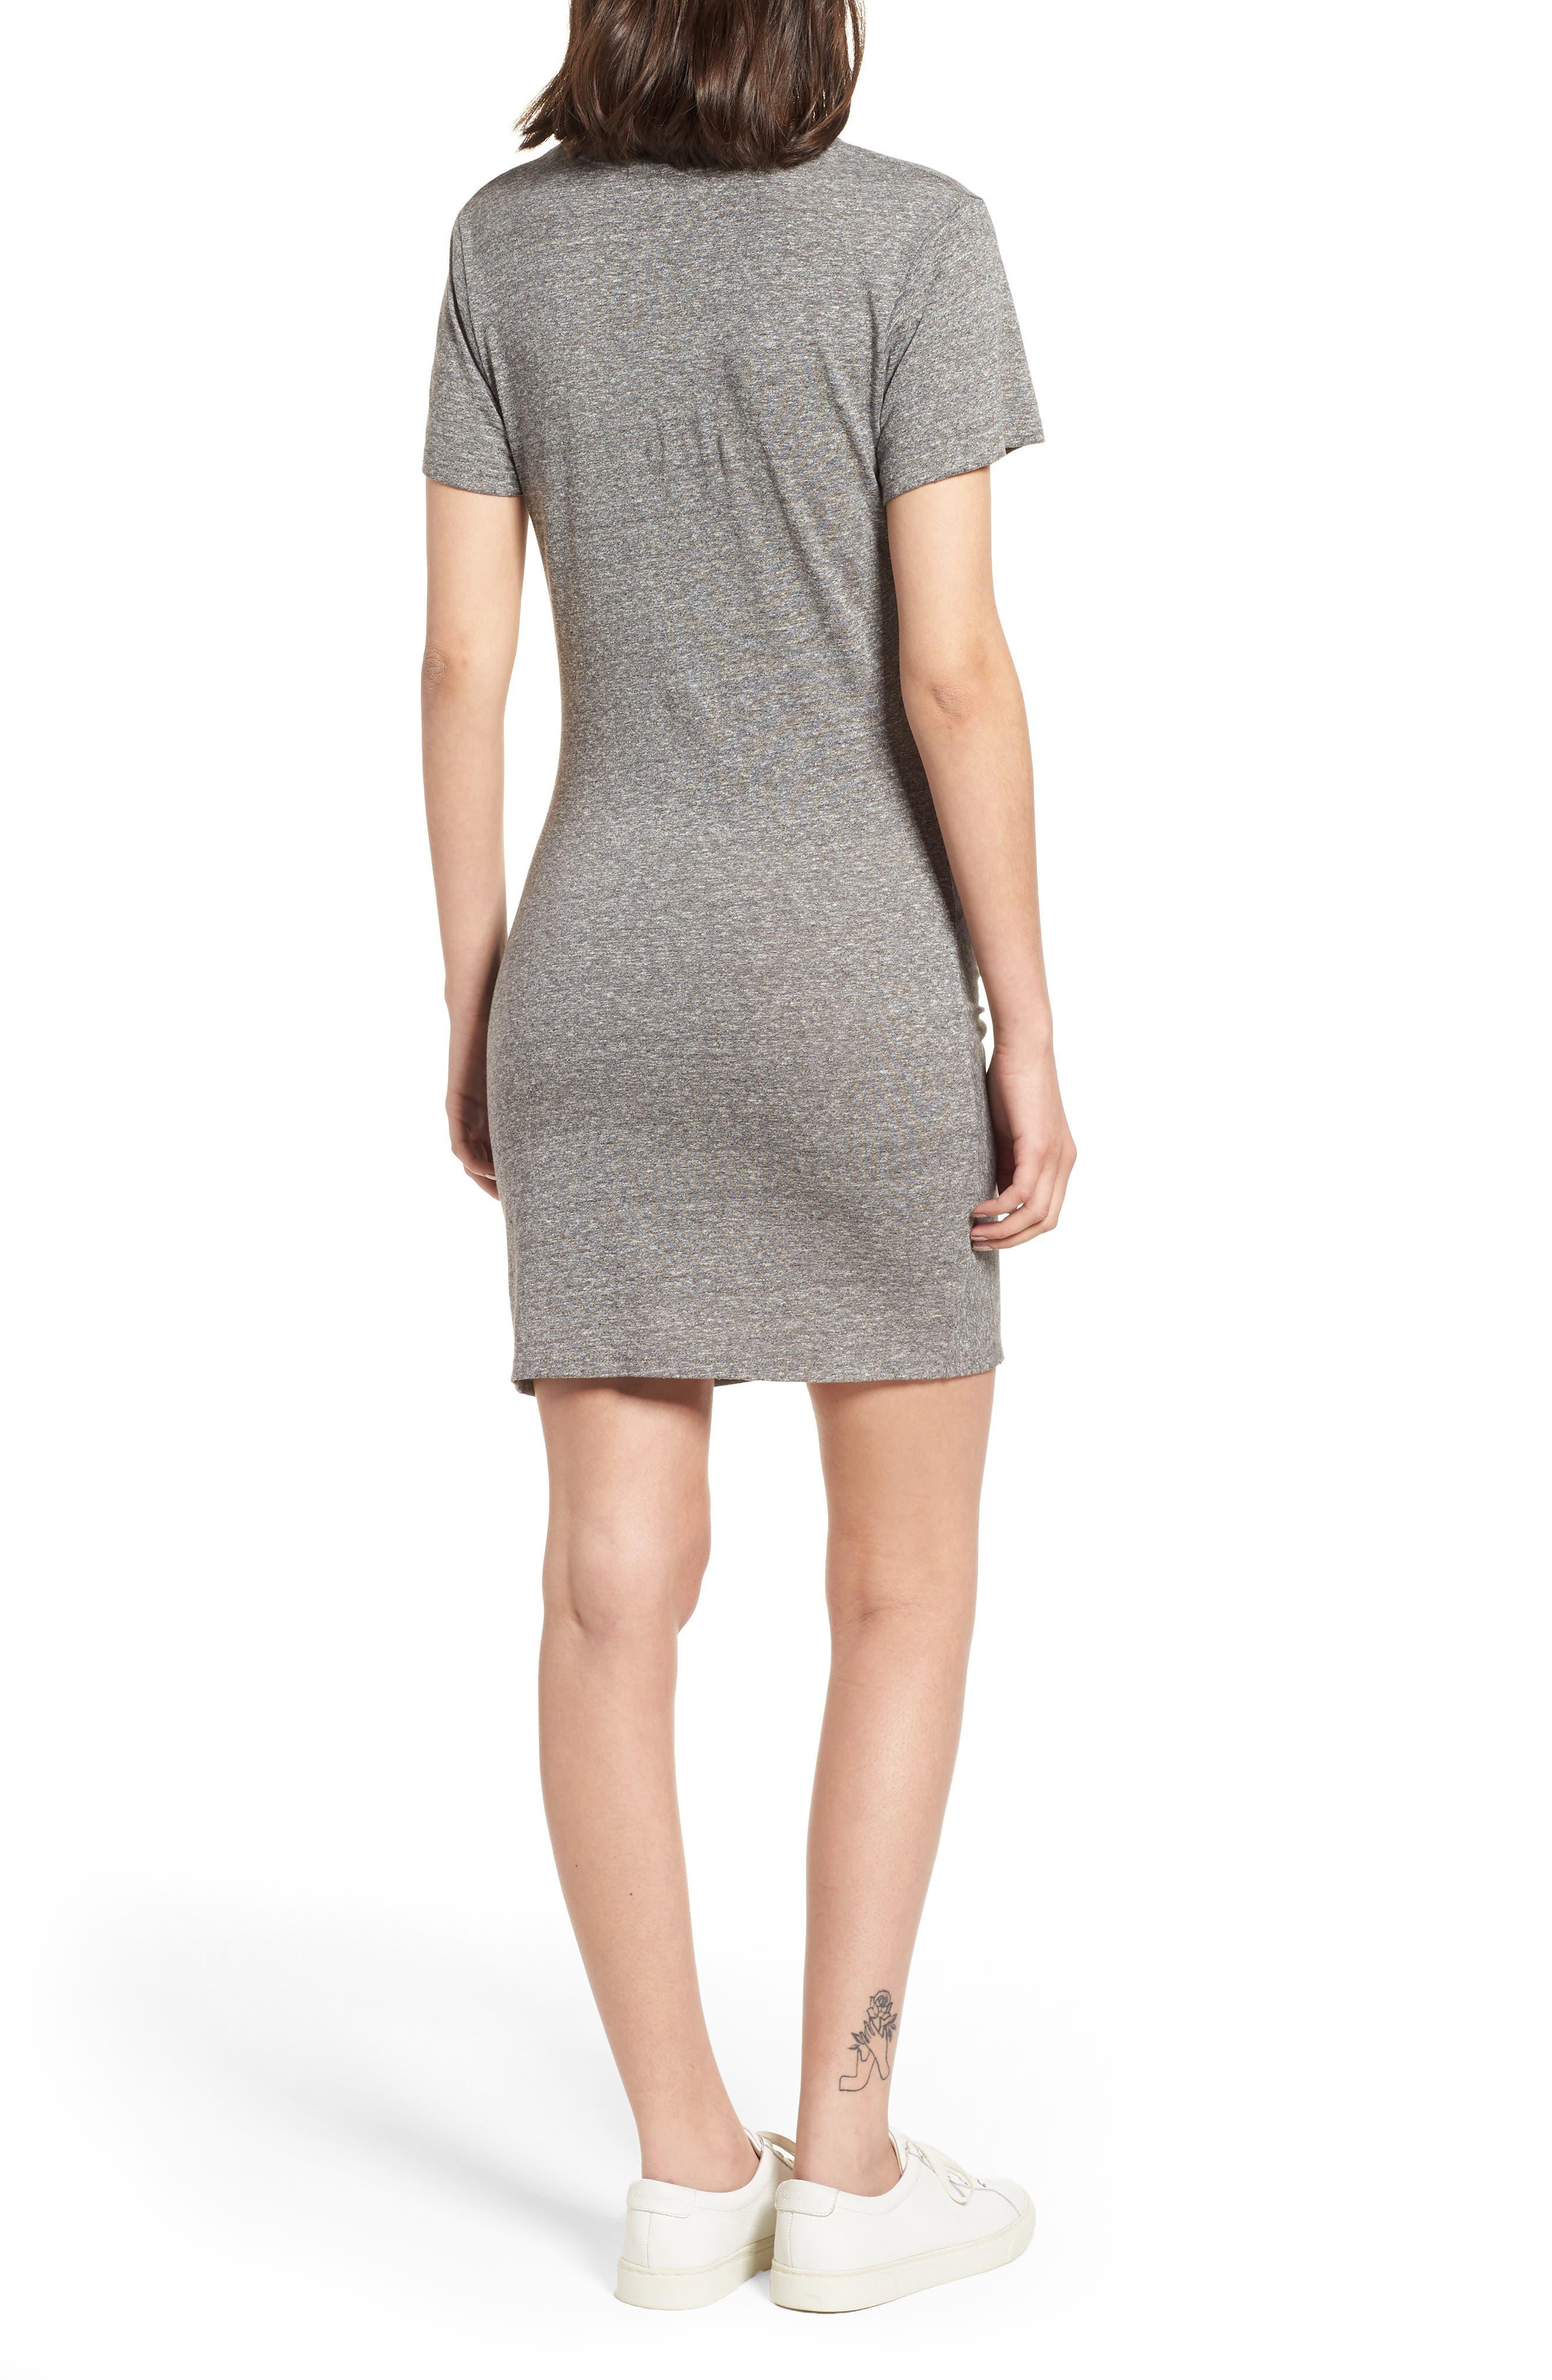 Jazz Twisted T-Shirt Dress,                             Alternate thumbnail 2, color,                             HEATHER GREY